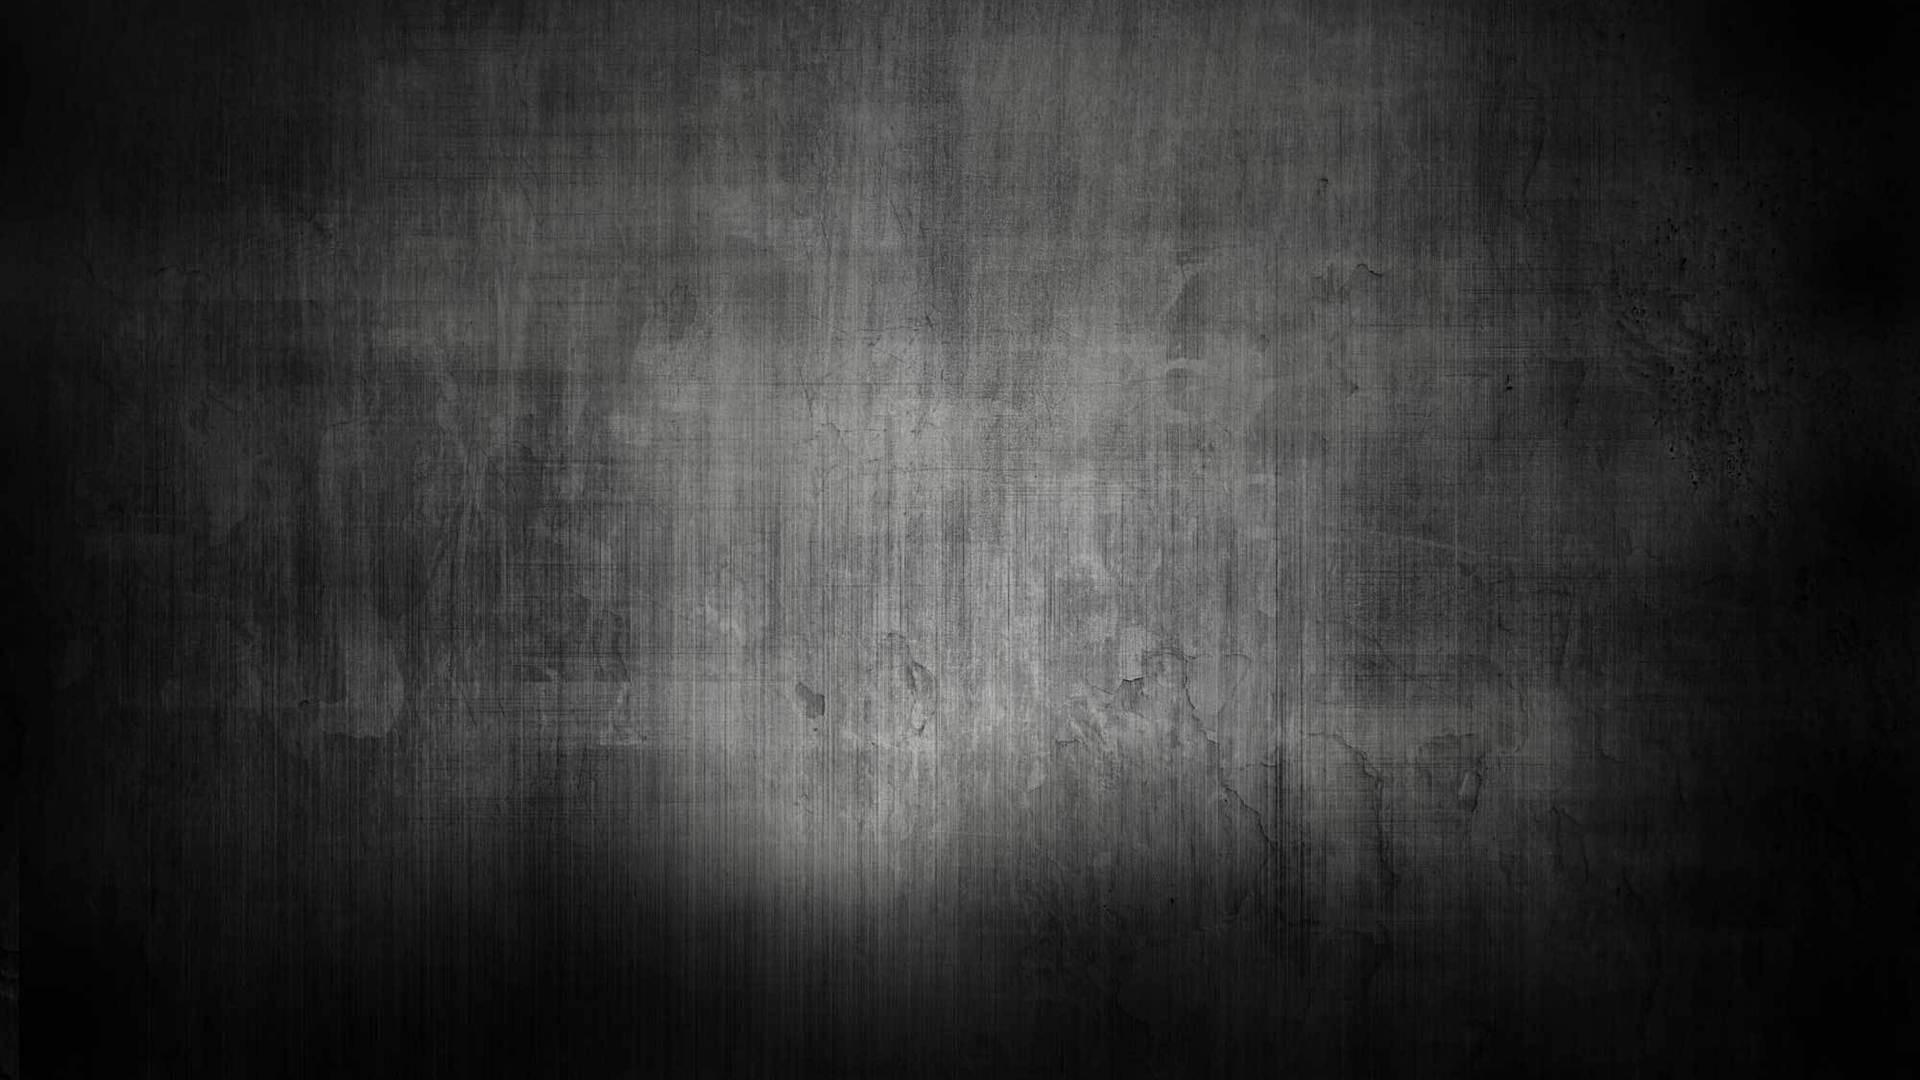 Dark Textured Backgrounds